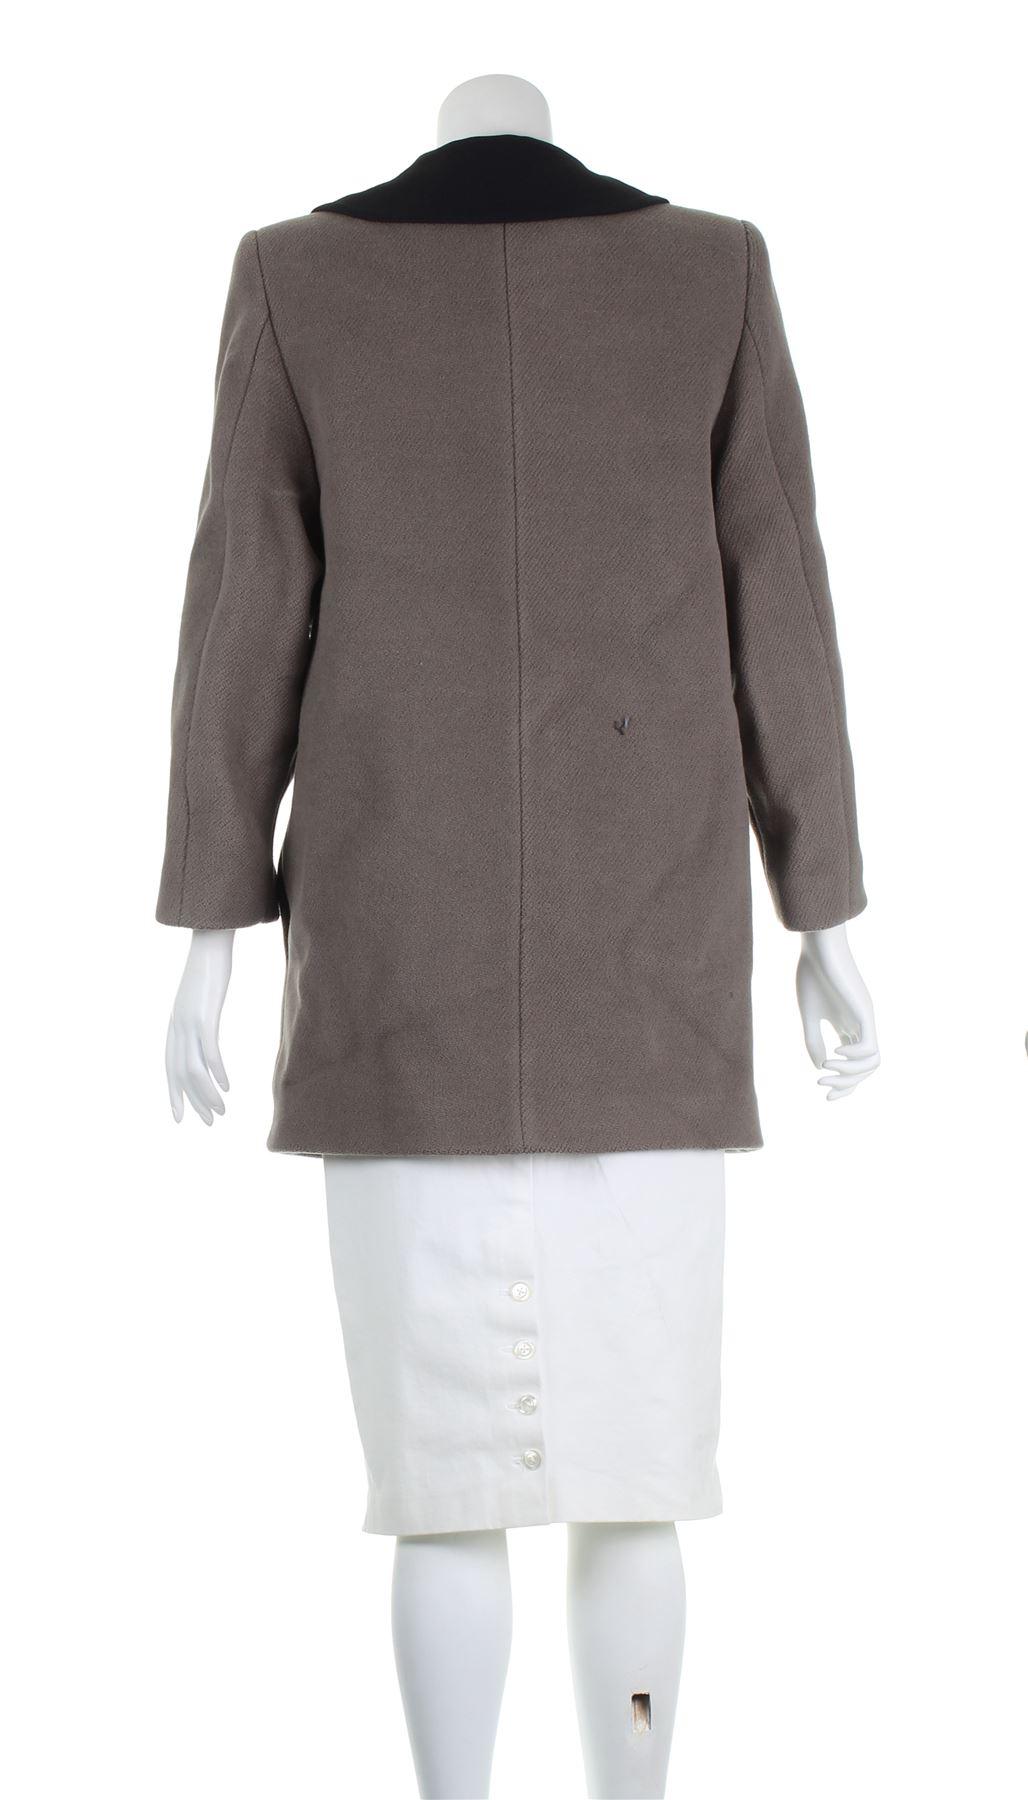 1a6dbec7b34b8 MIU MIU Black Collar Grey Wool Coat